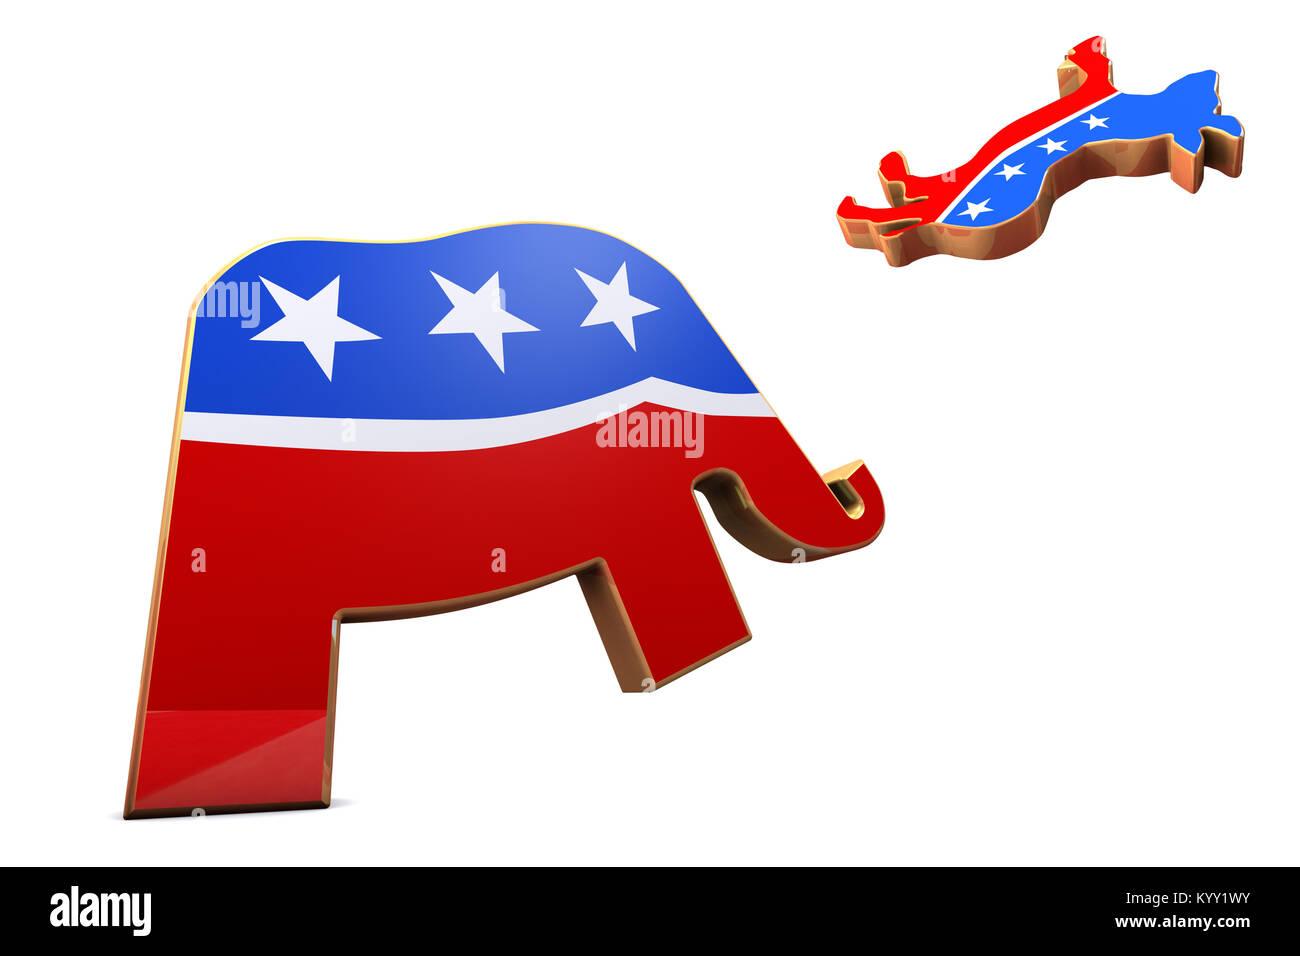 Democrat party badge stock photos democrat party badge stock democrat party and republican party symbols stock image biocorpaavc Image collections